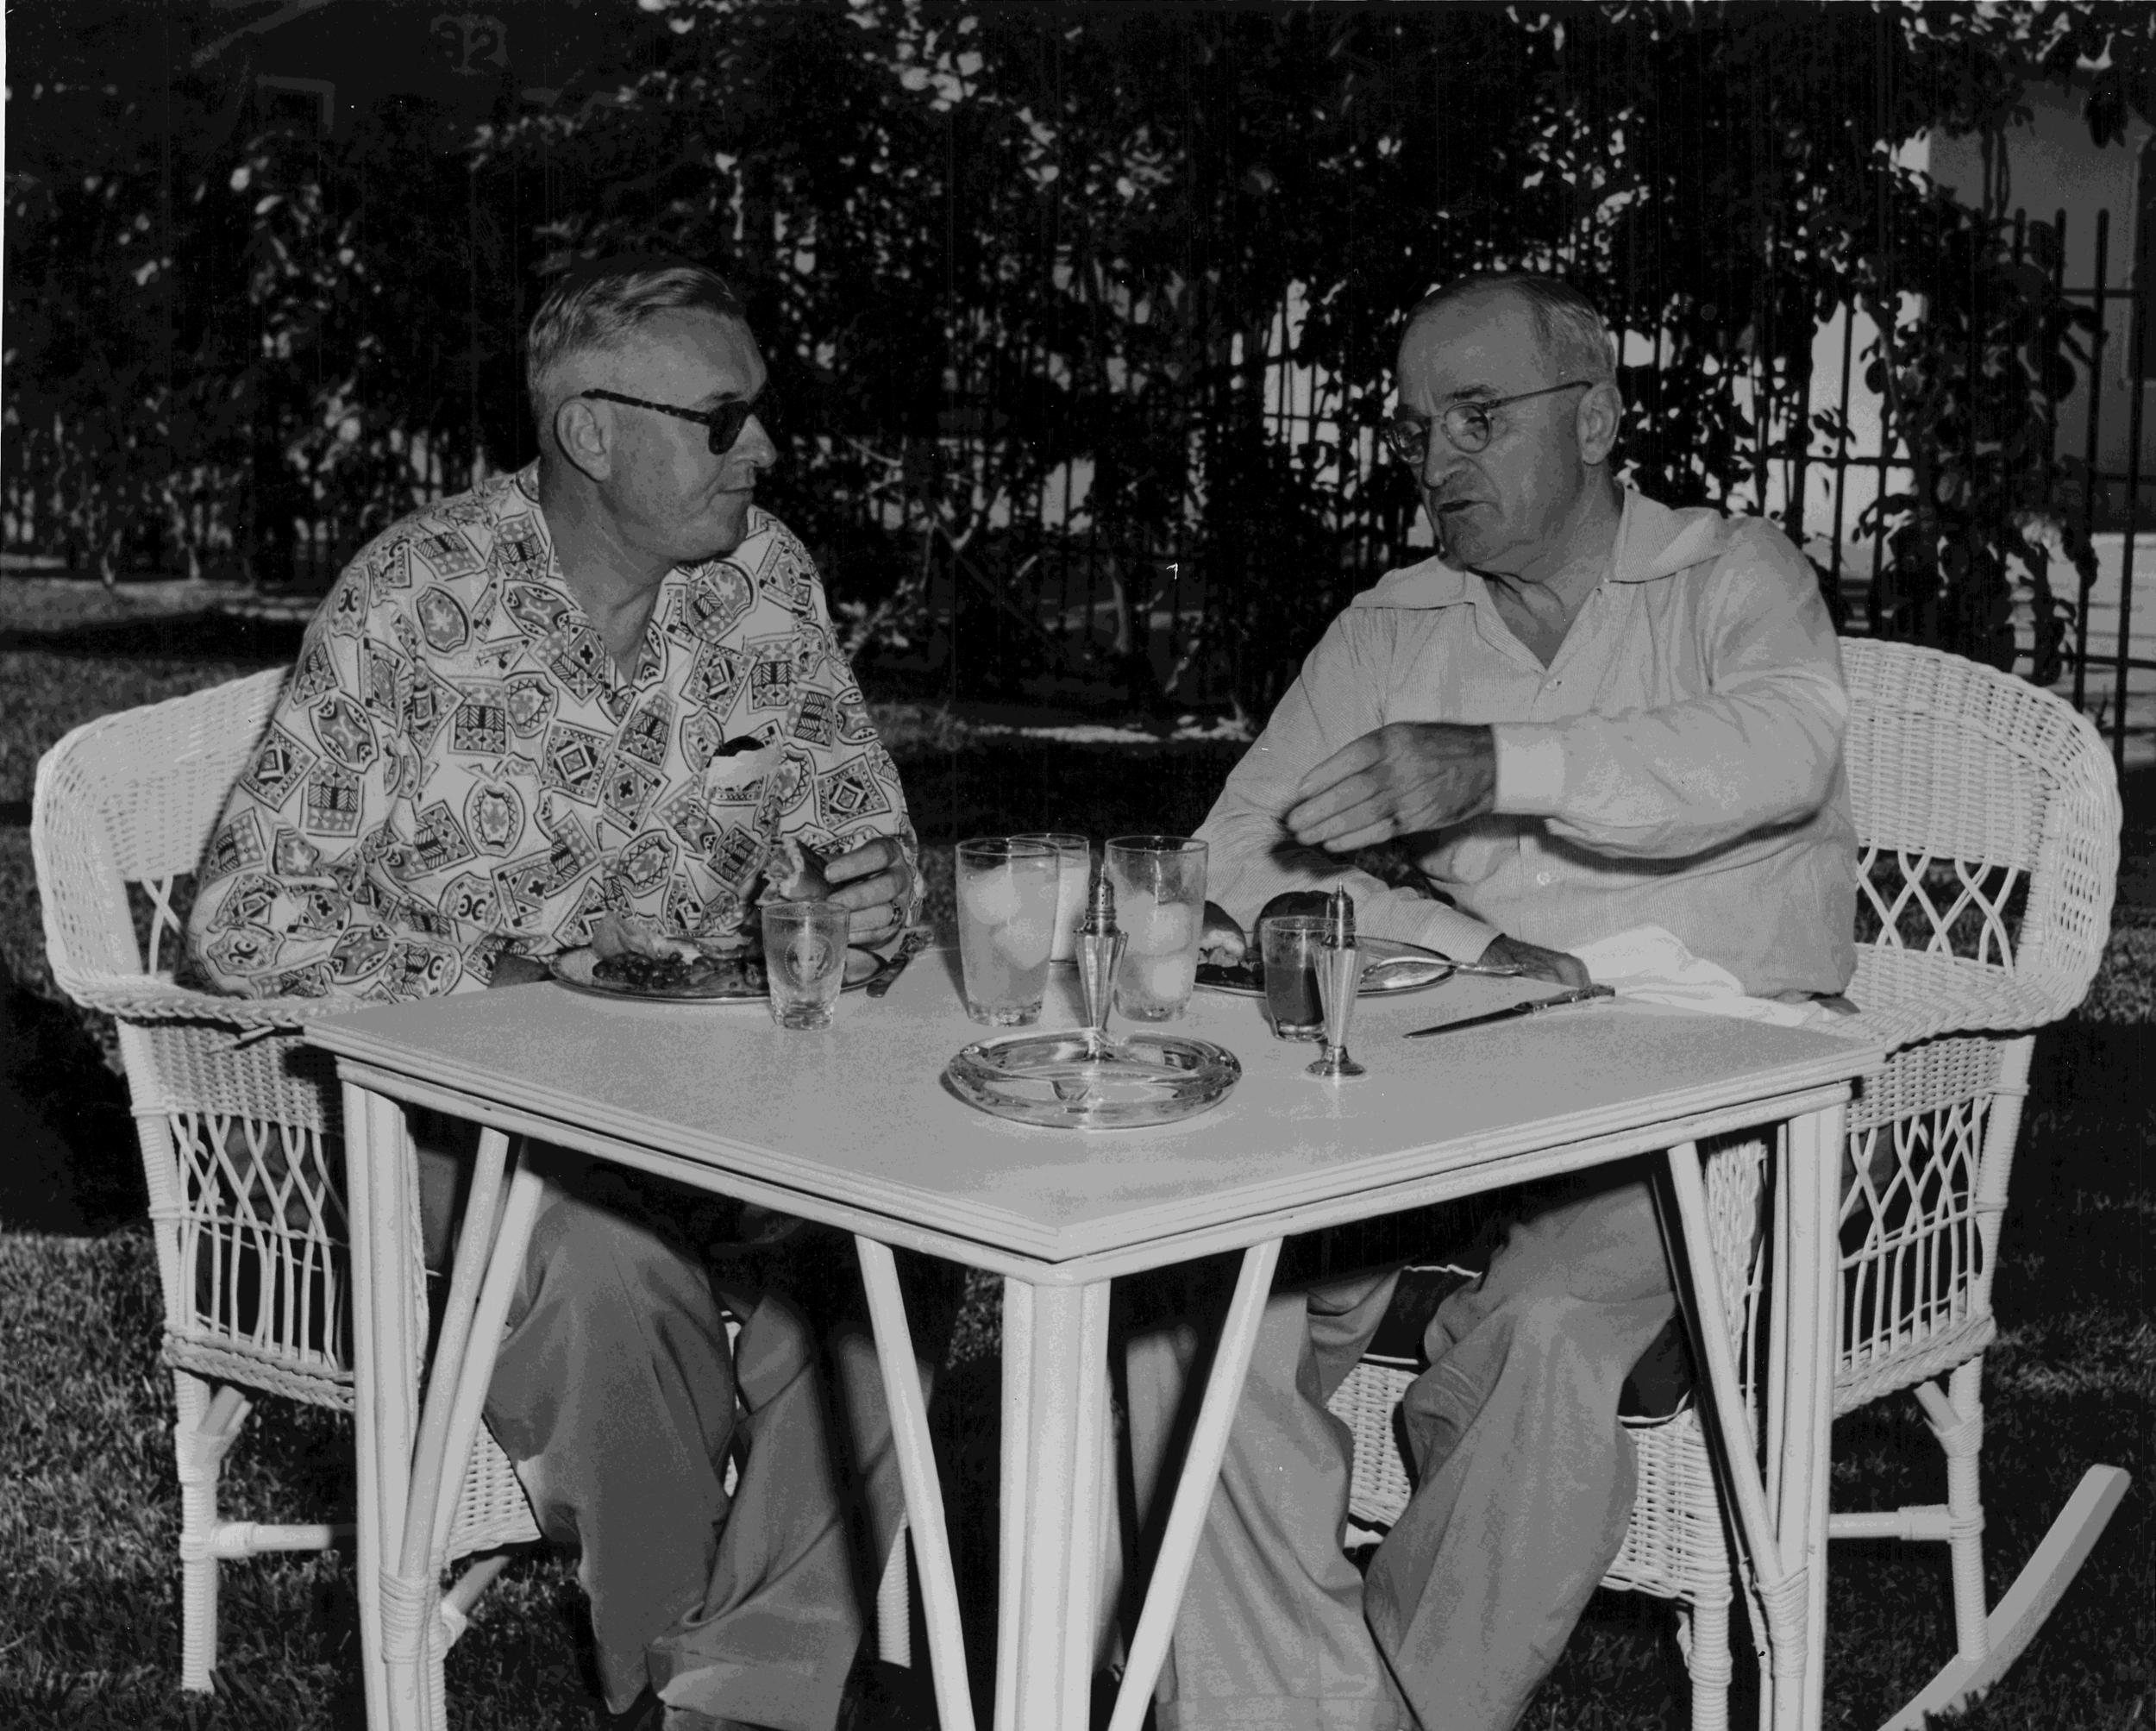 Chief of Staff Steelman briefs President Truman